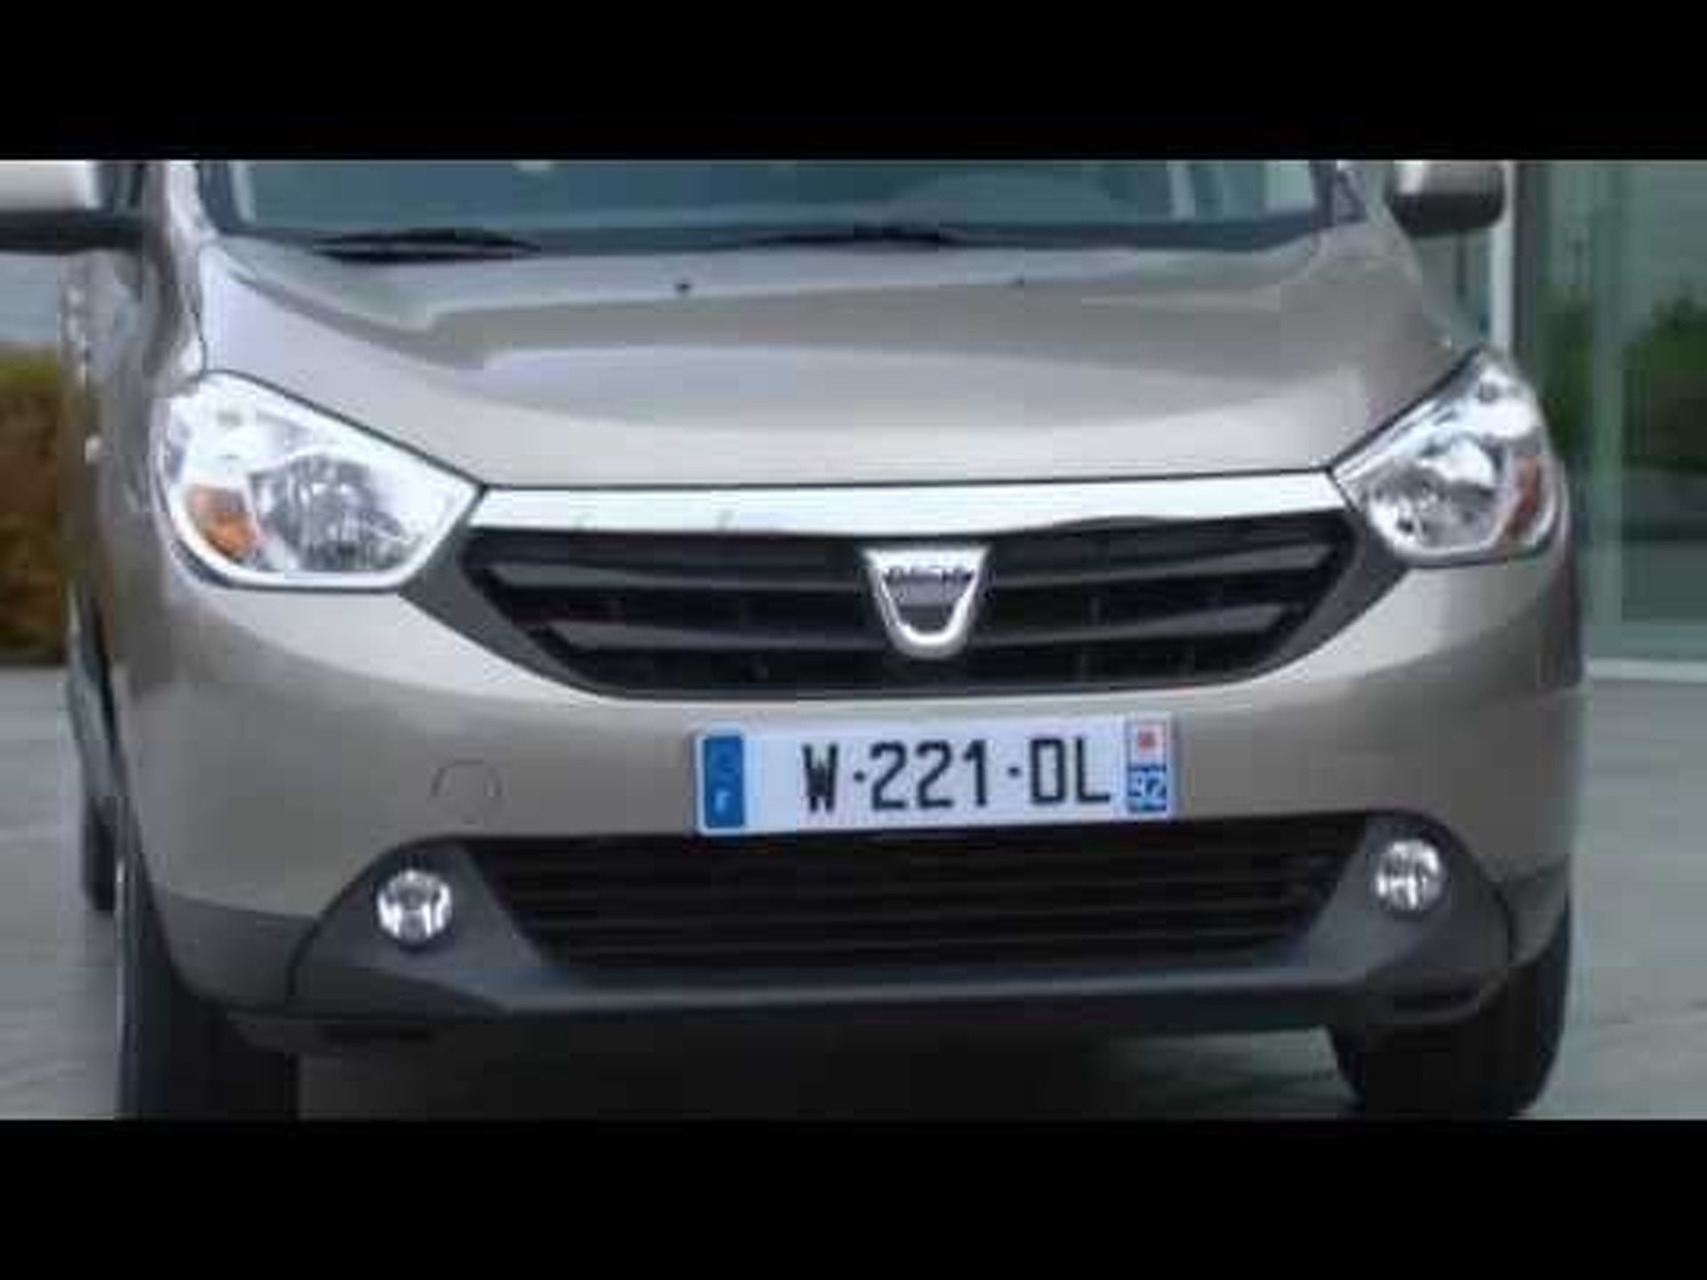 2013 Dacia Lodgy - exterior shots